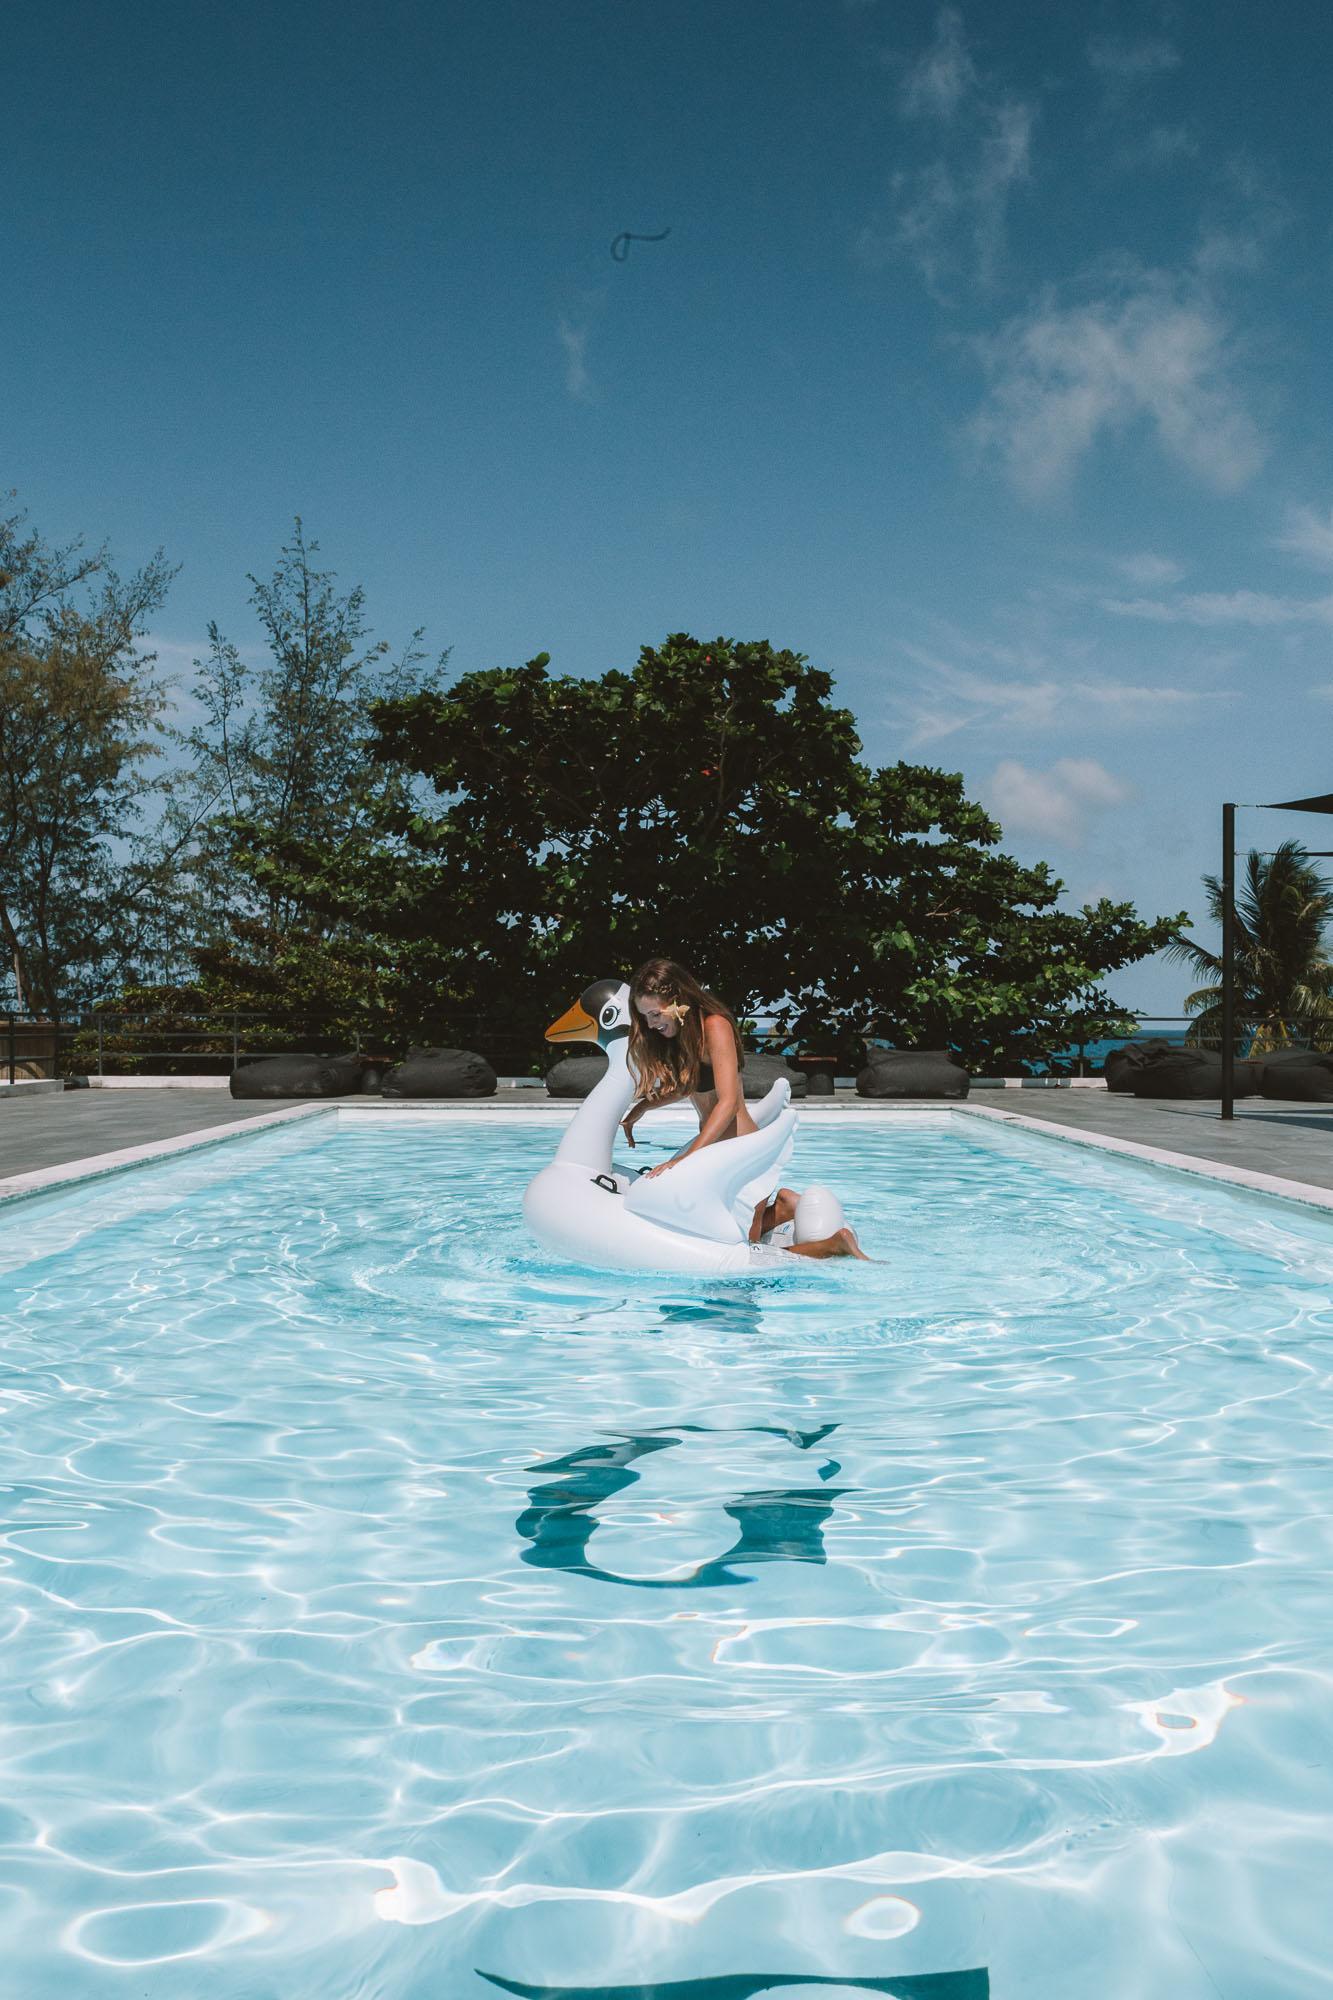 Hostel Swimming Pool - Koh Tao